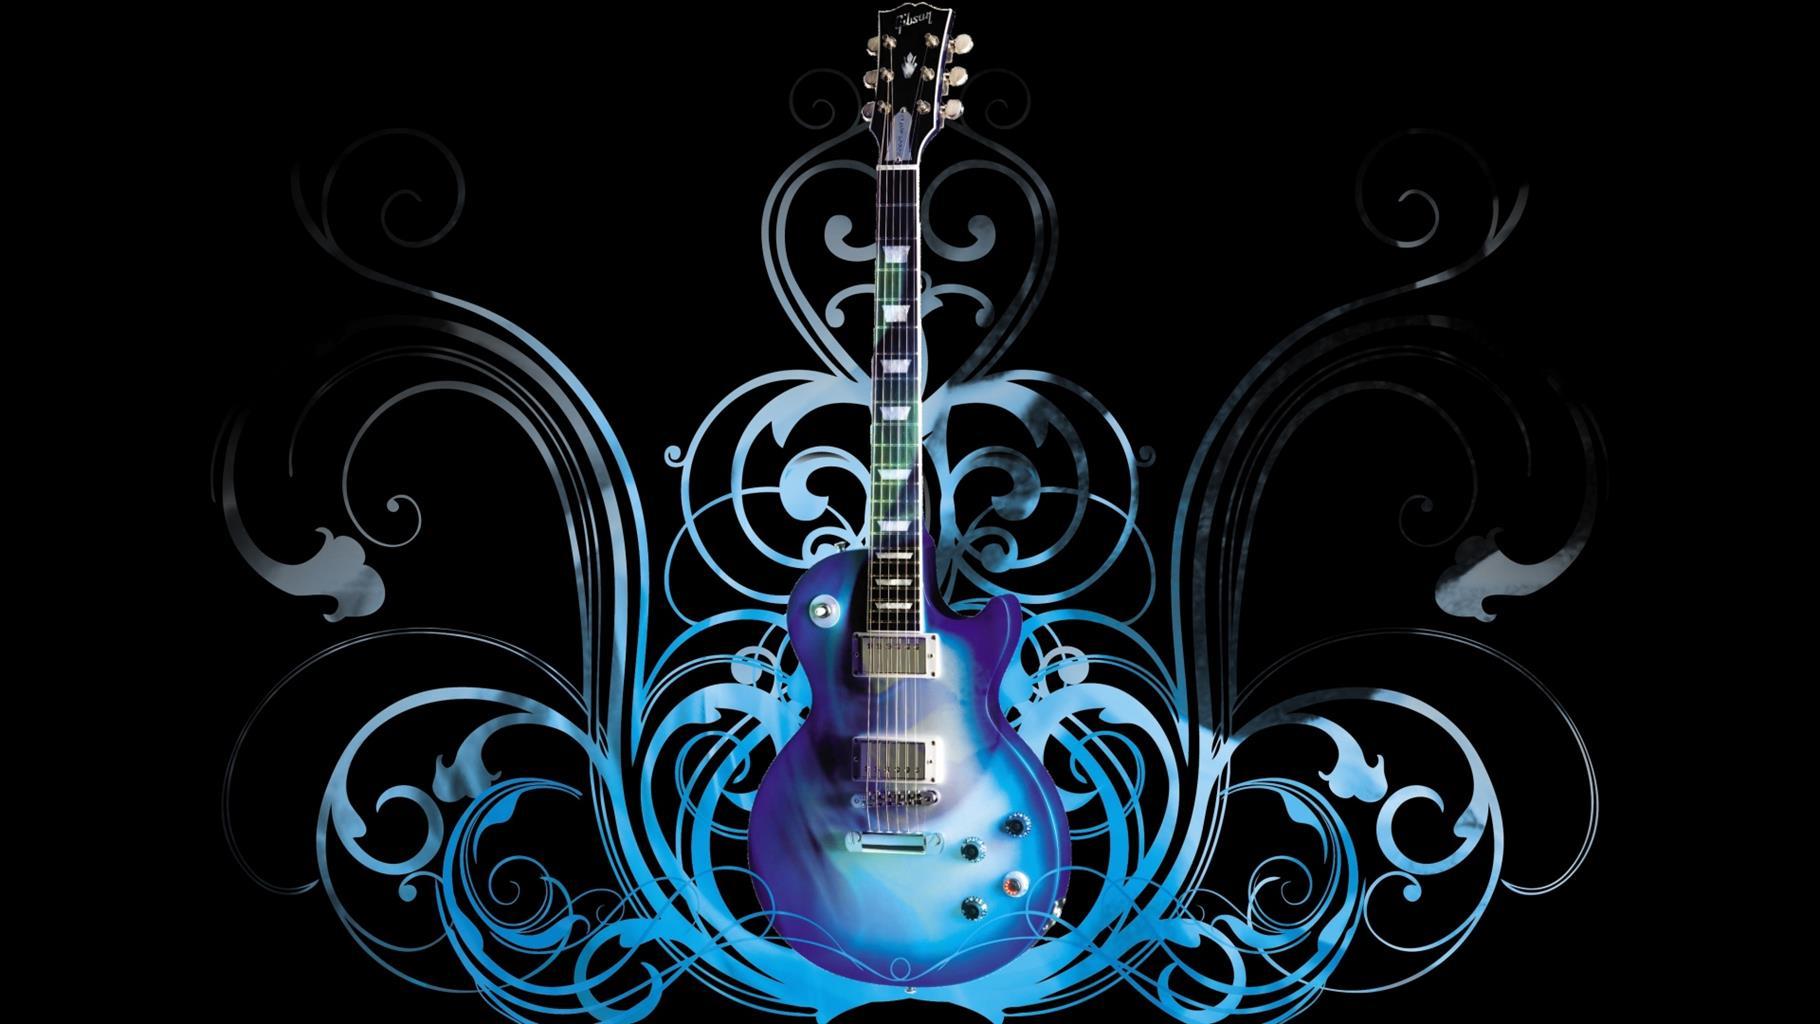 Kitaarlesse vir beginners in Pretoria/Guitar lessons for beginners and intermediates